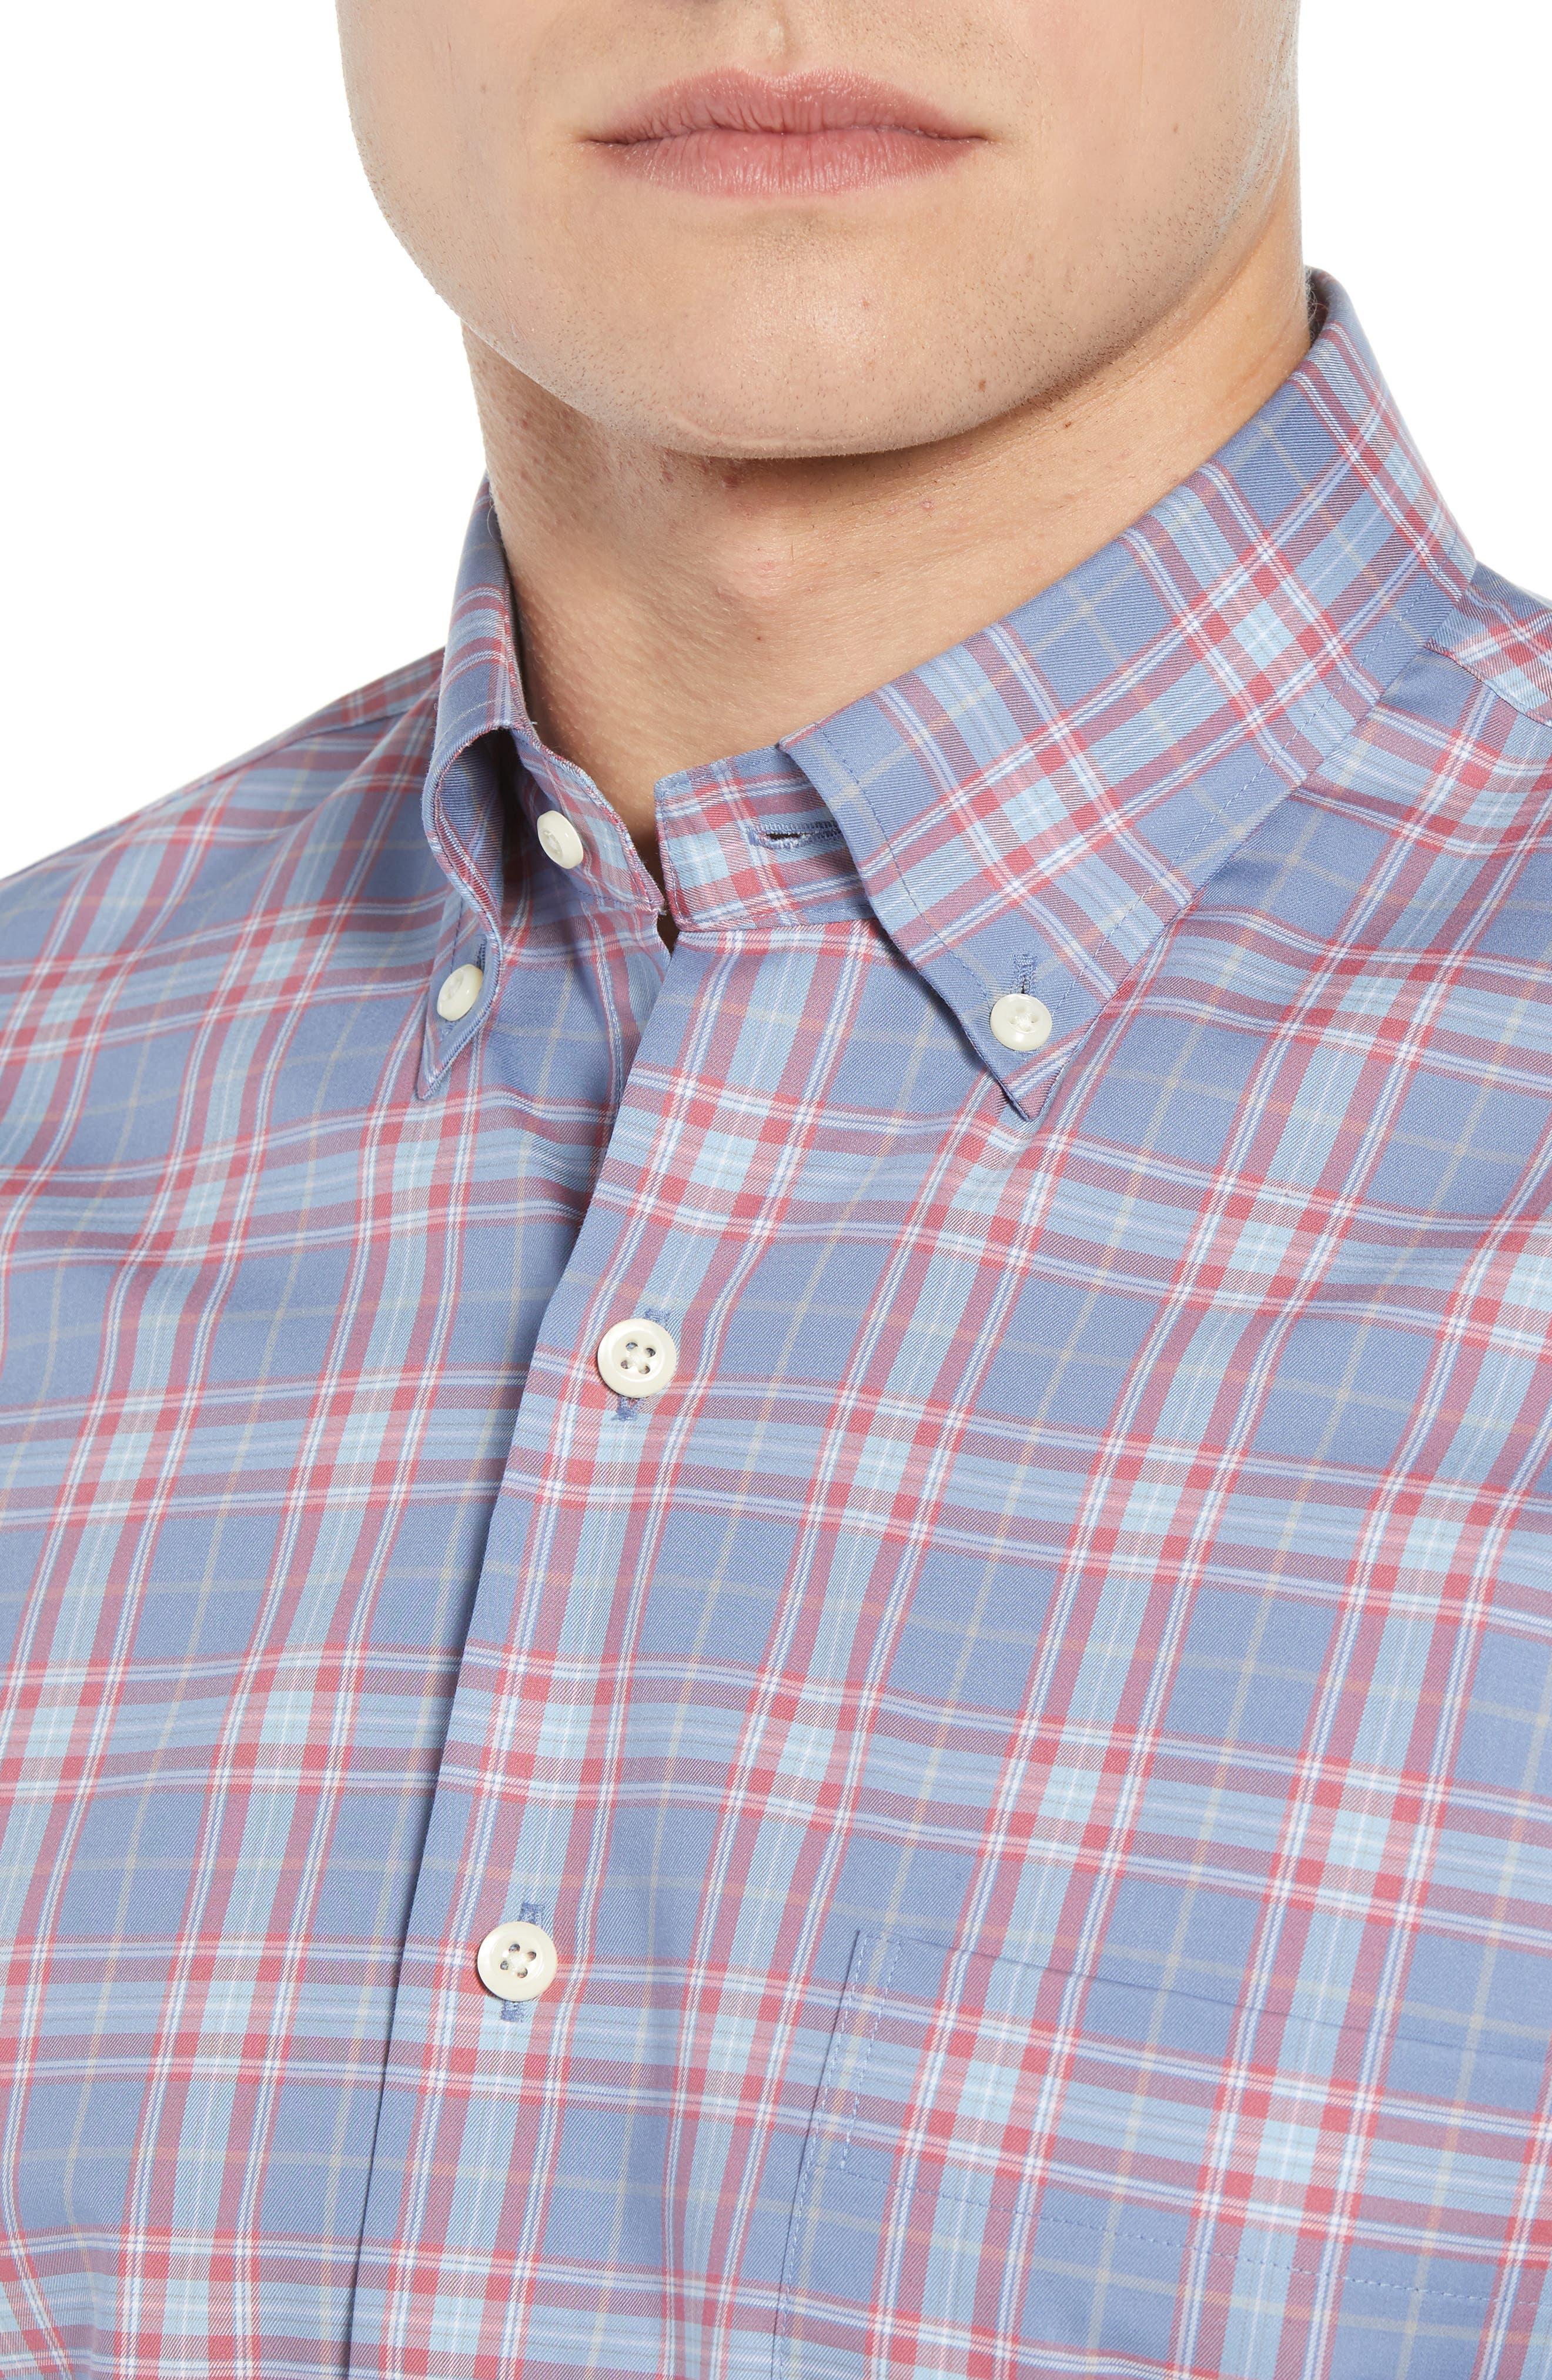 Crown Ease Archipelago Regular Fit Plaid Sport Shirt,                             Alternate thumbnail 2, color,                             524